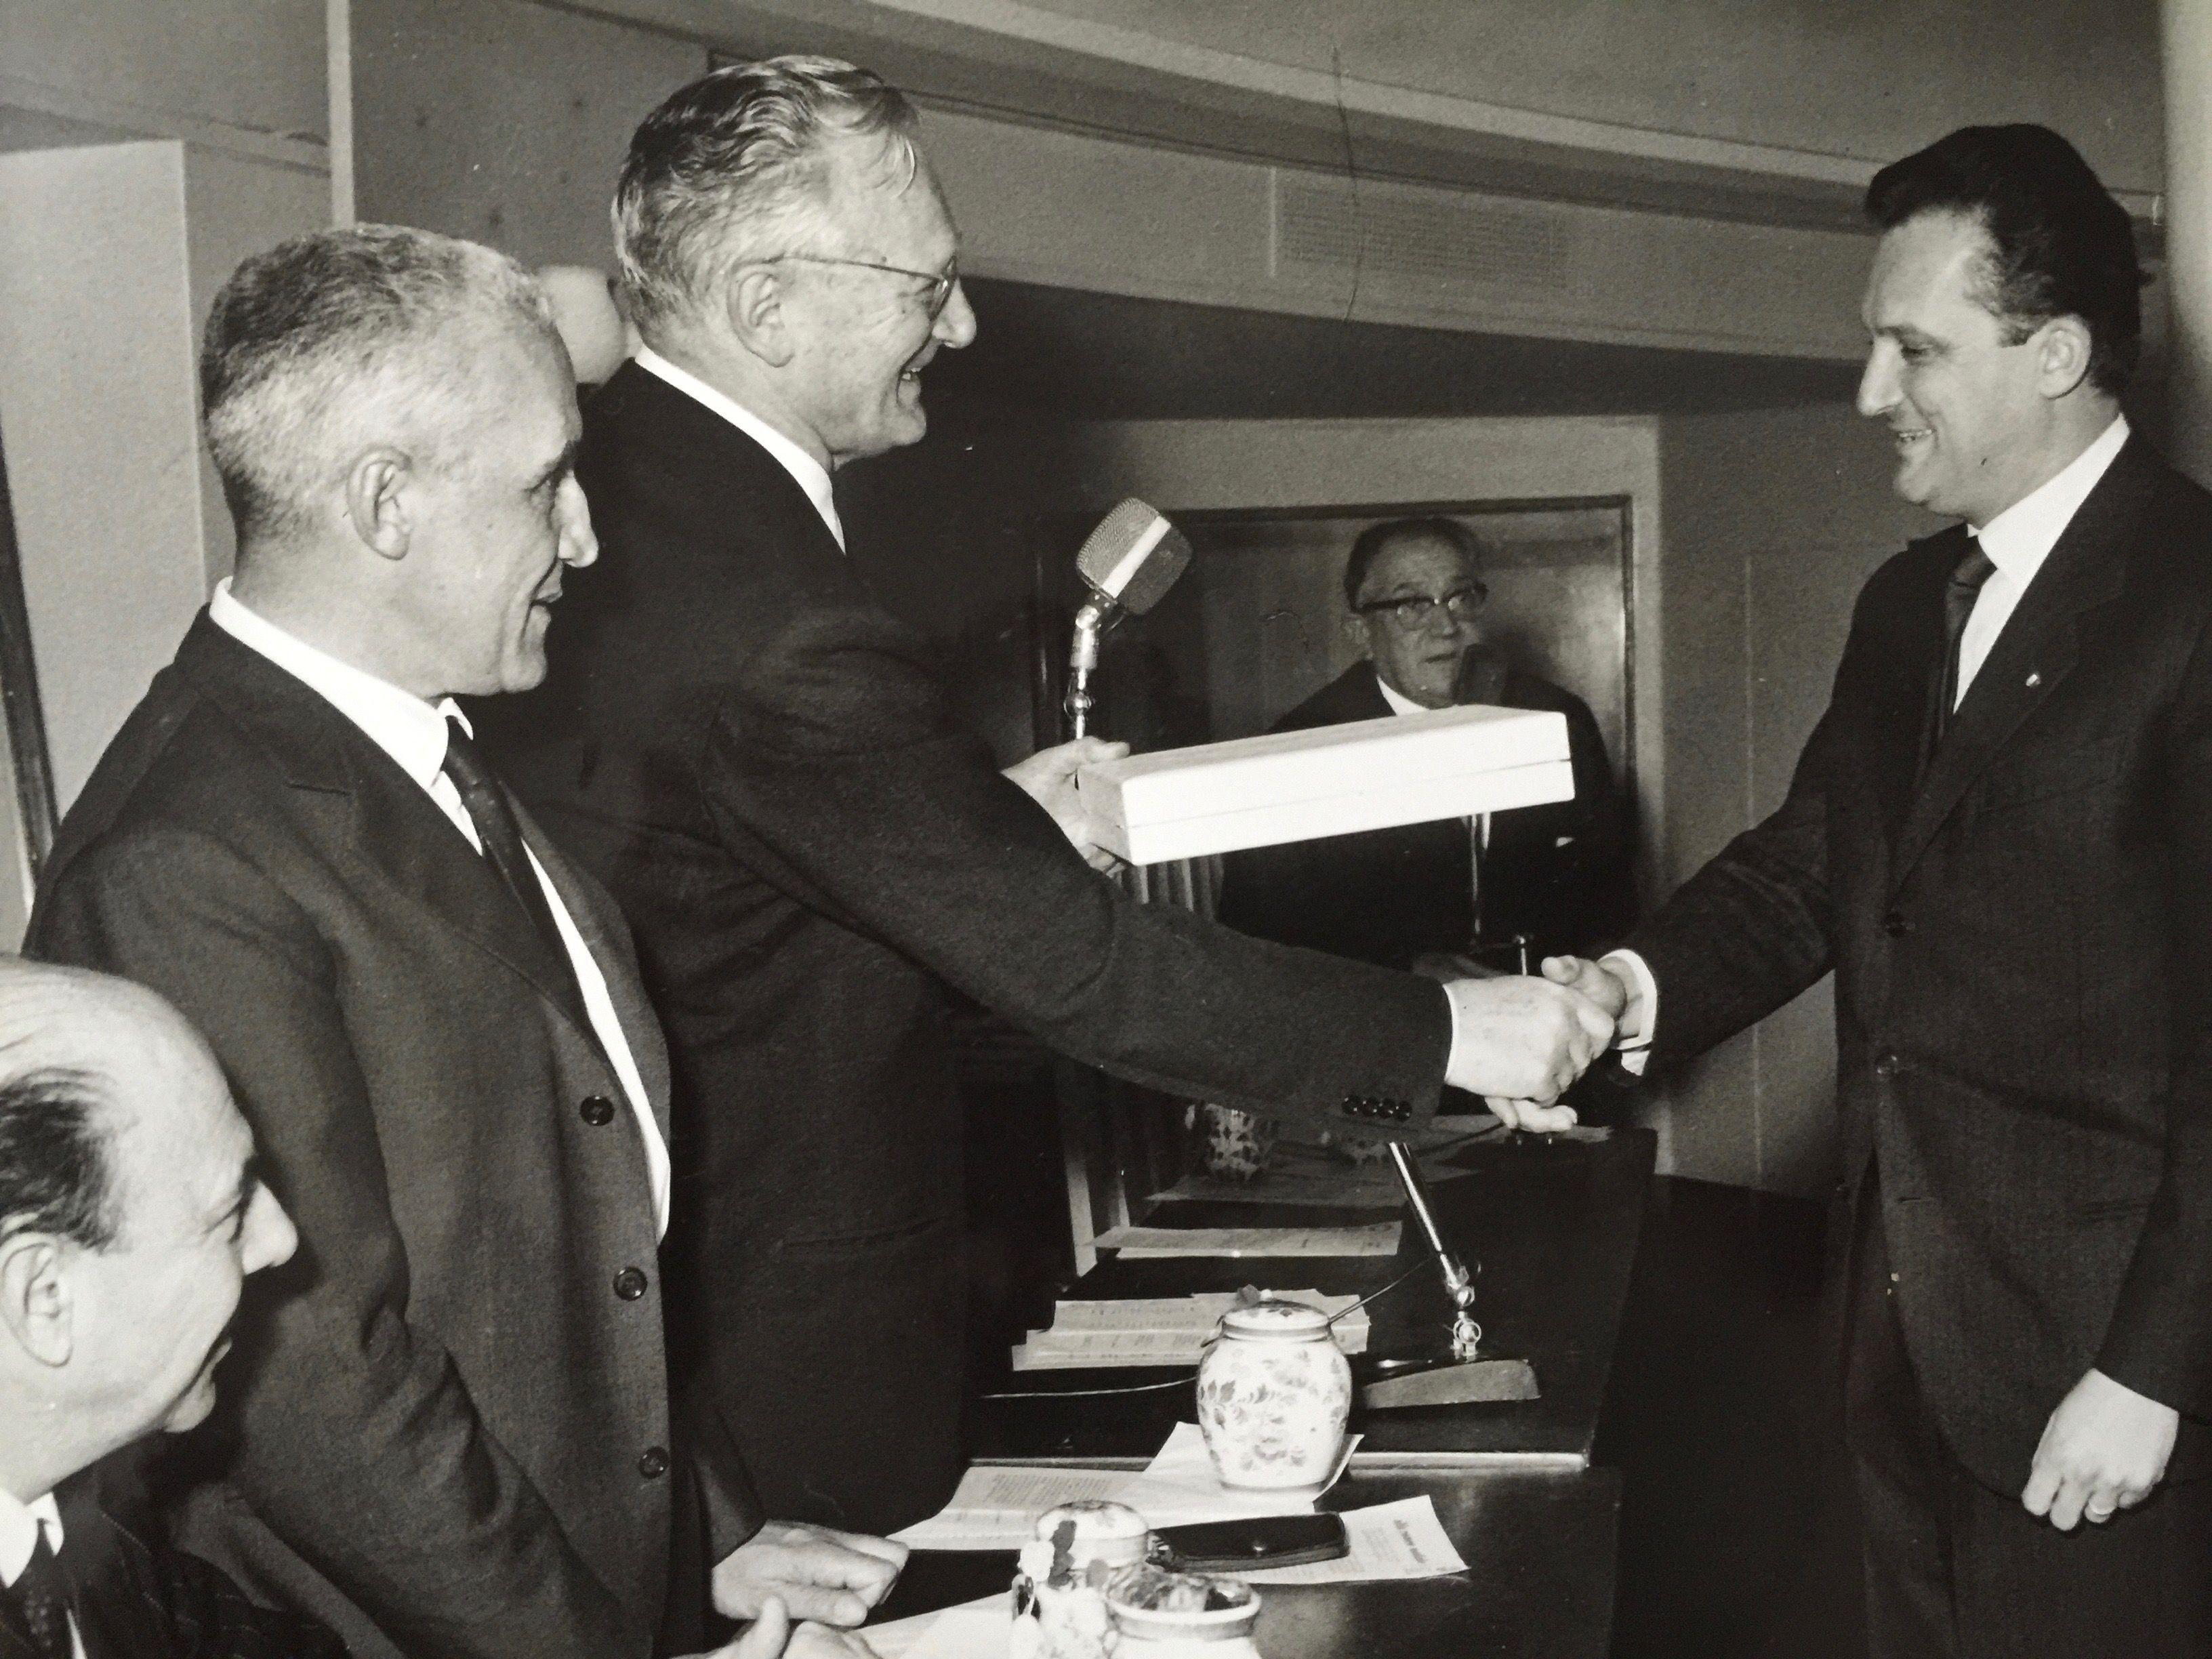 Piero Gancia at the Alfa Romeo 1964 prize giving with Dr. Luraghi, President of Alfa Romeo